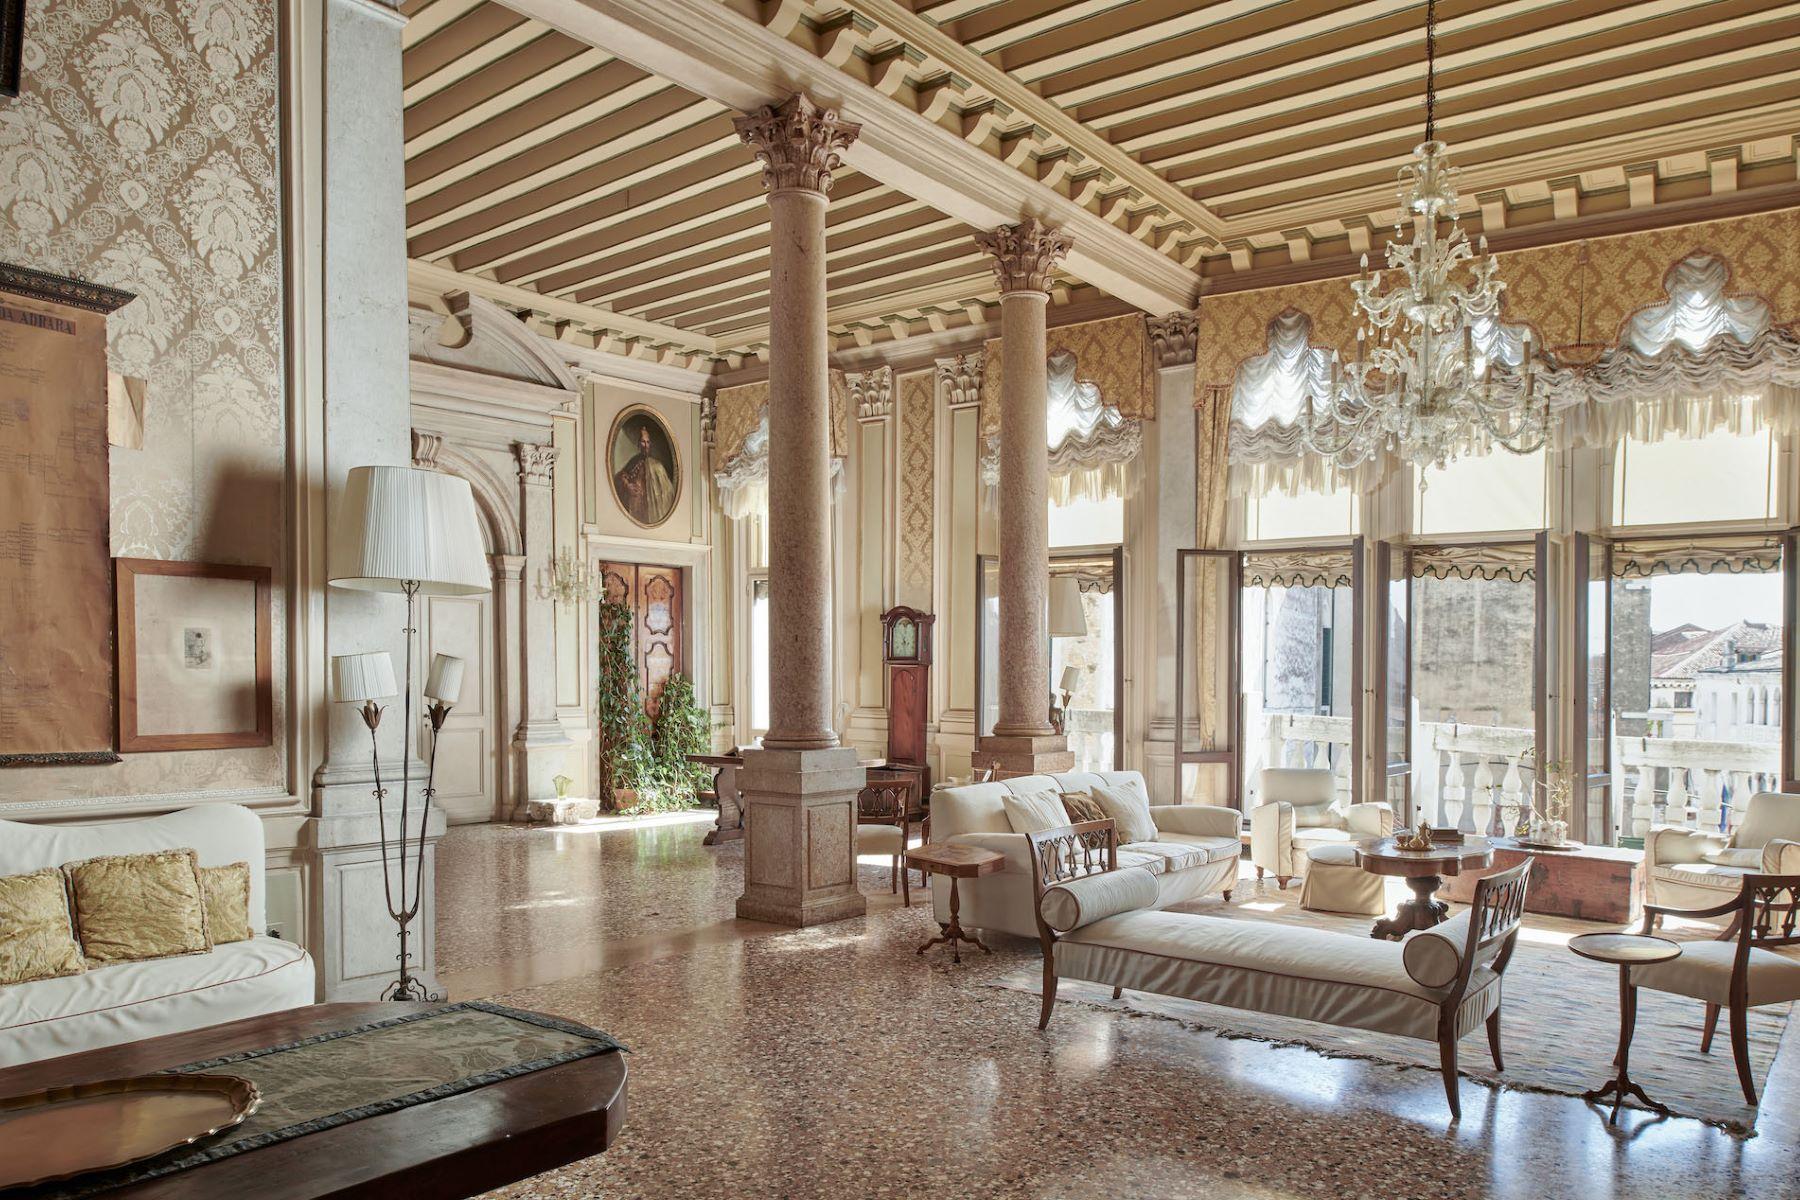 Single Family Homes for Sale at Monumental Piano Nobile Grand Canal Dorsoduro 1057 Venezia, Venice 30123 Italy